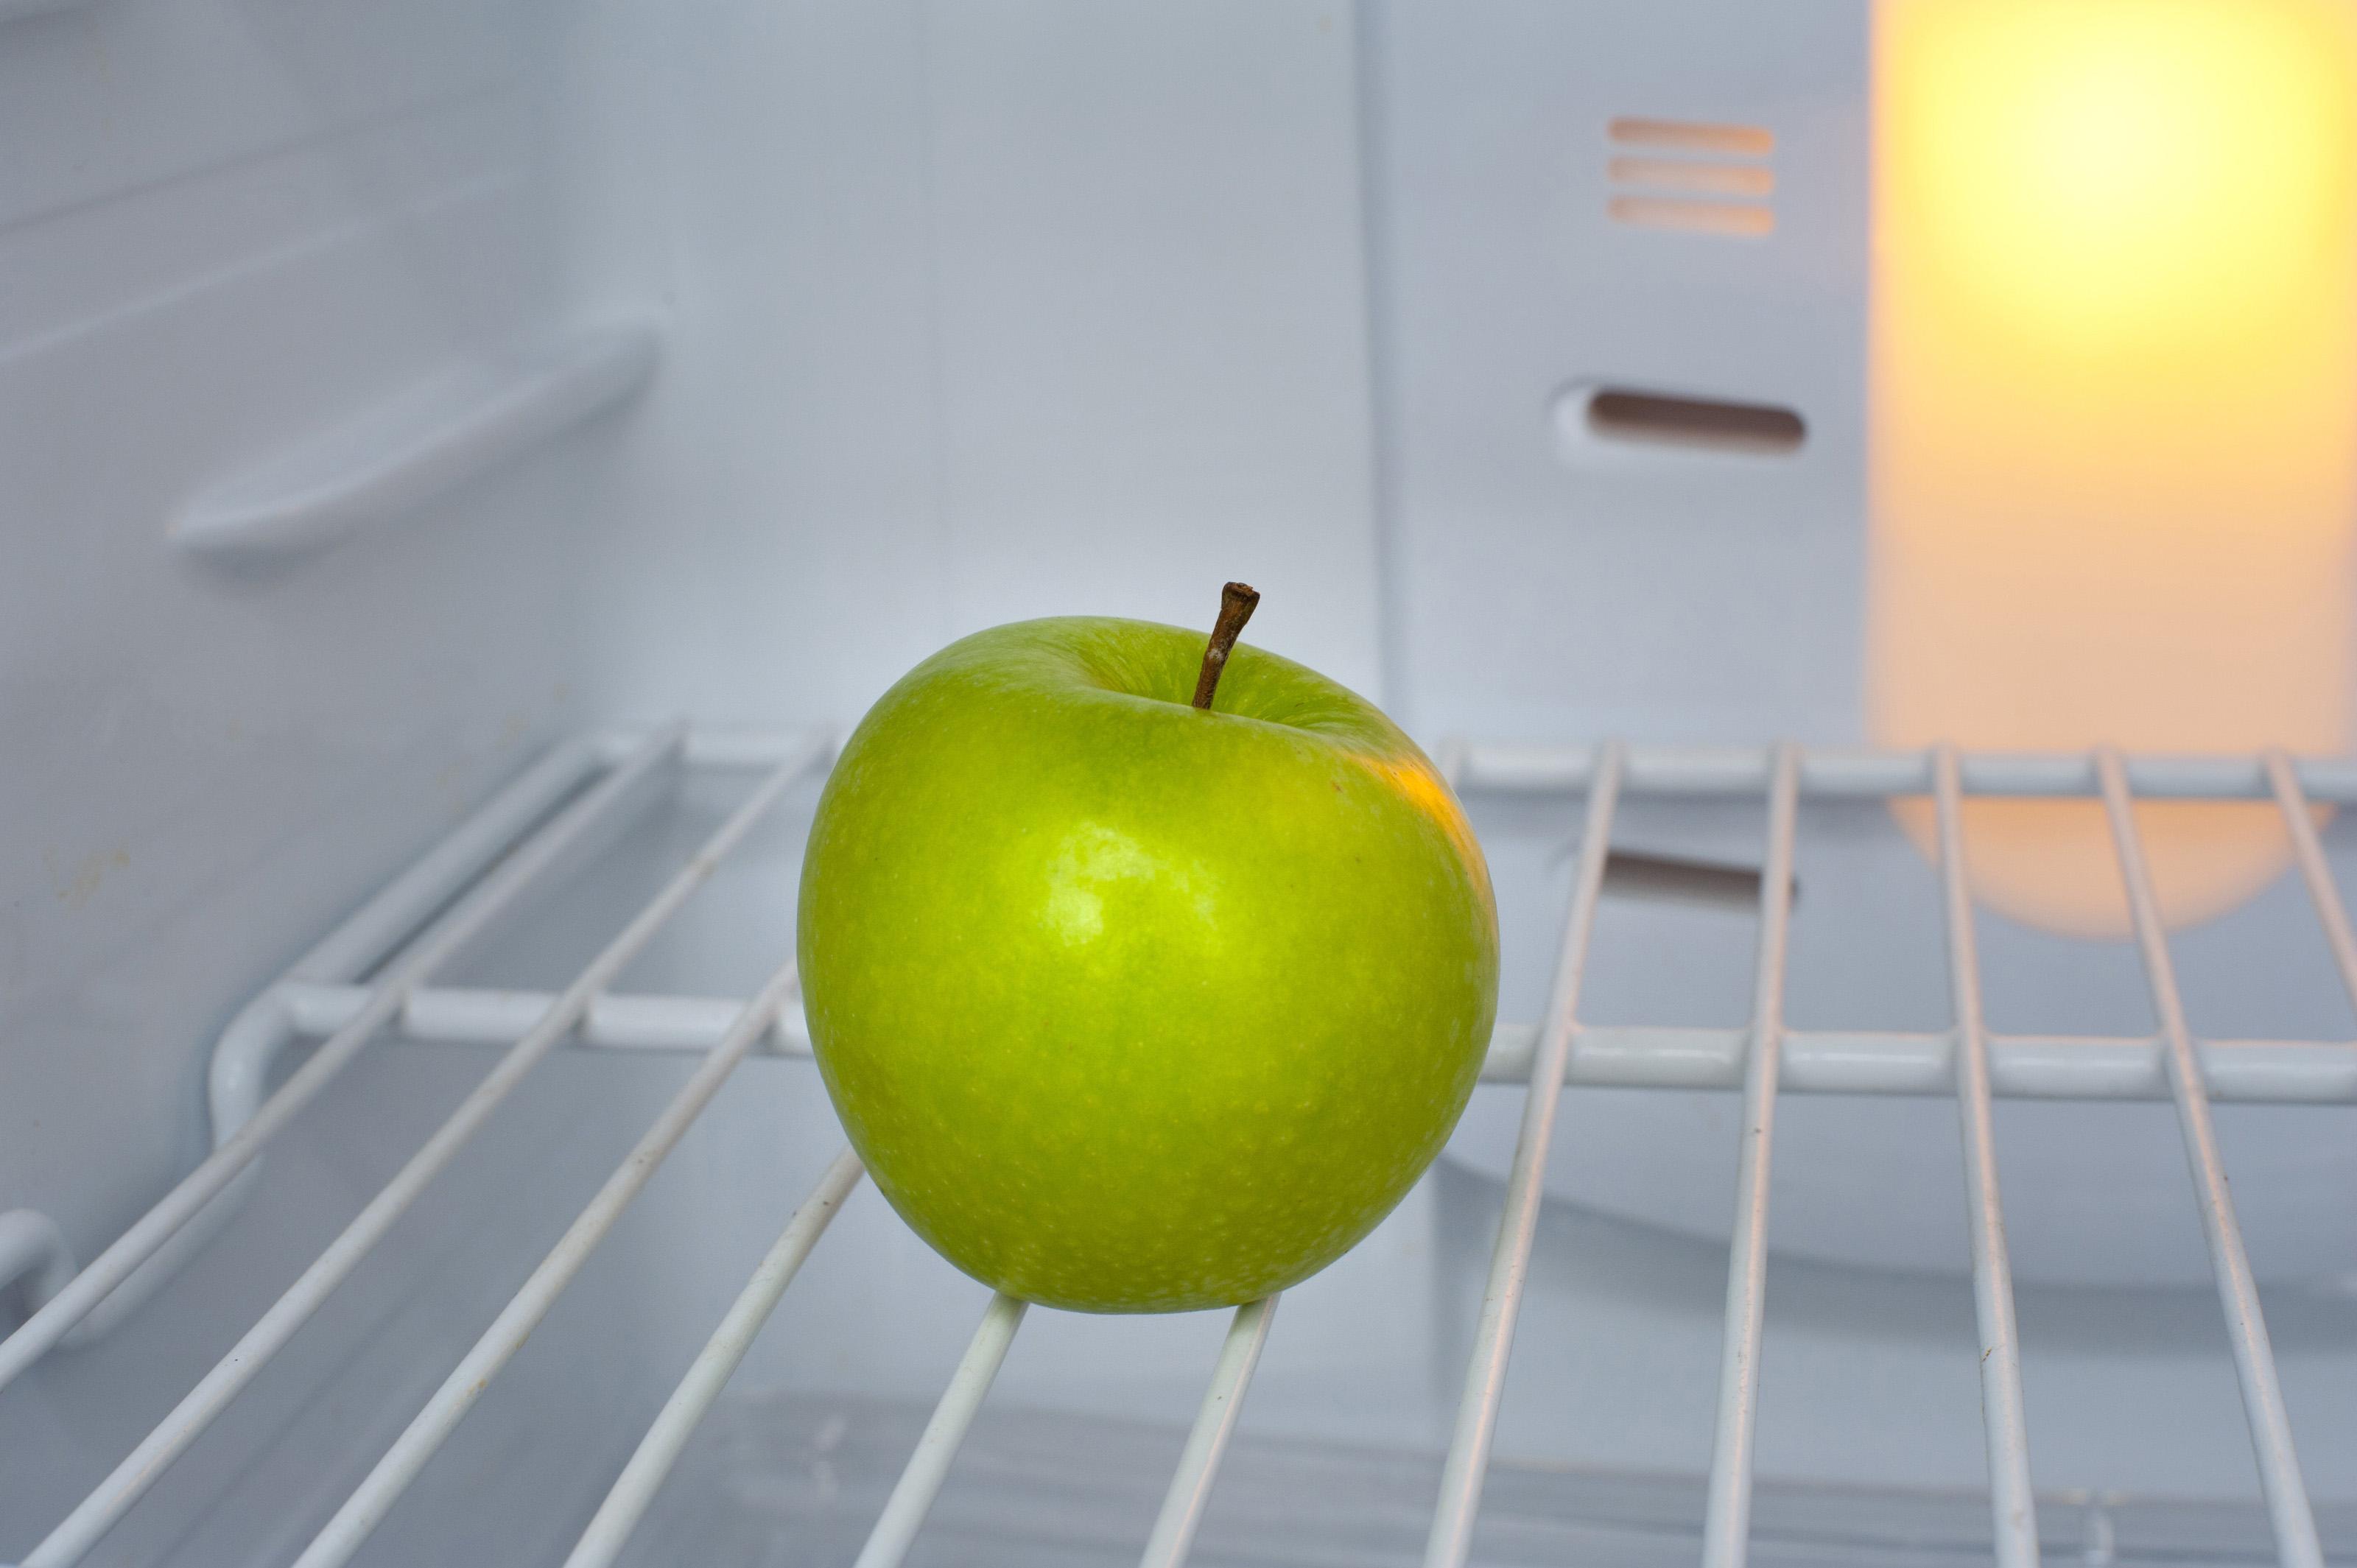 Free Stock Photo 8220 Green Apple In An Empty Fridge